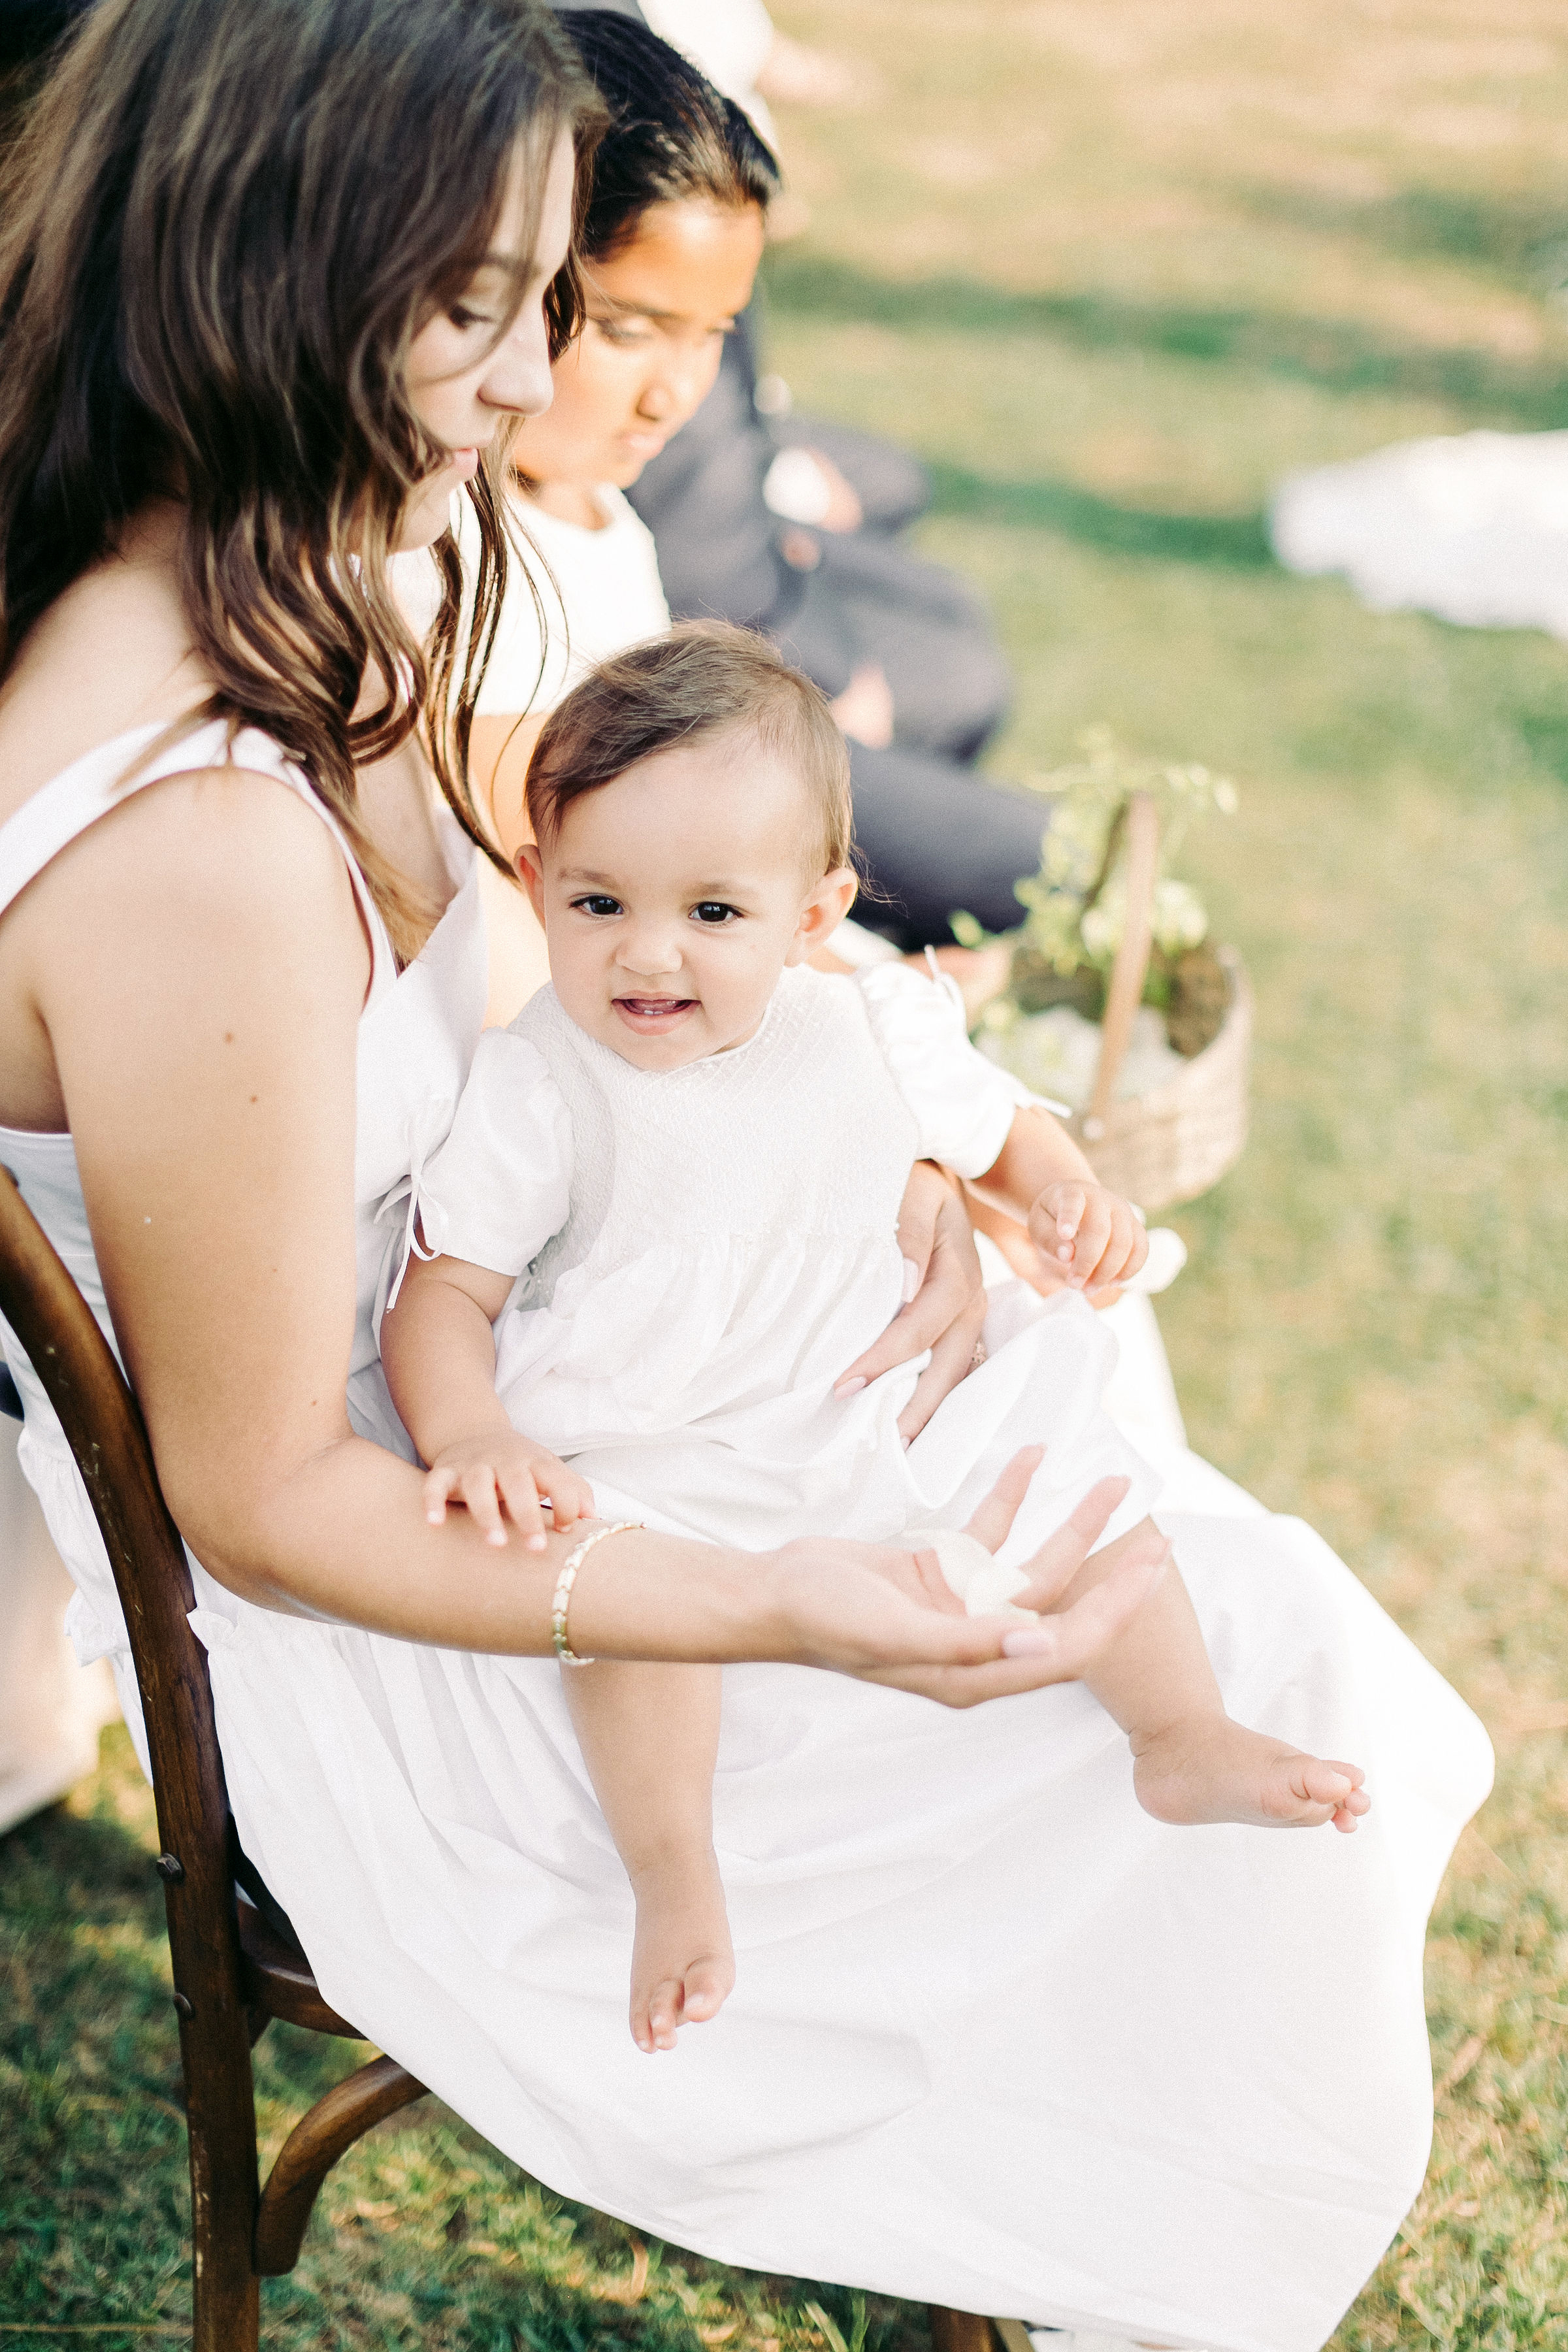 kseniya sadhir wedding italy baby on lap